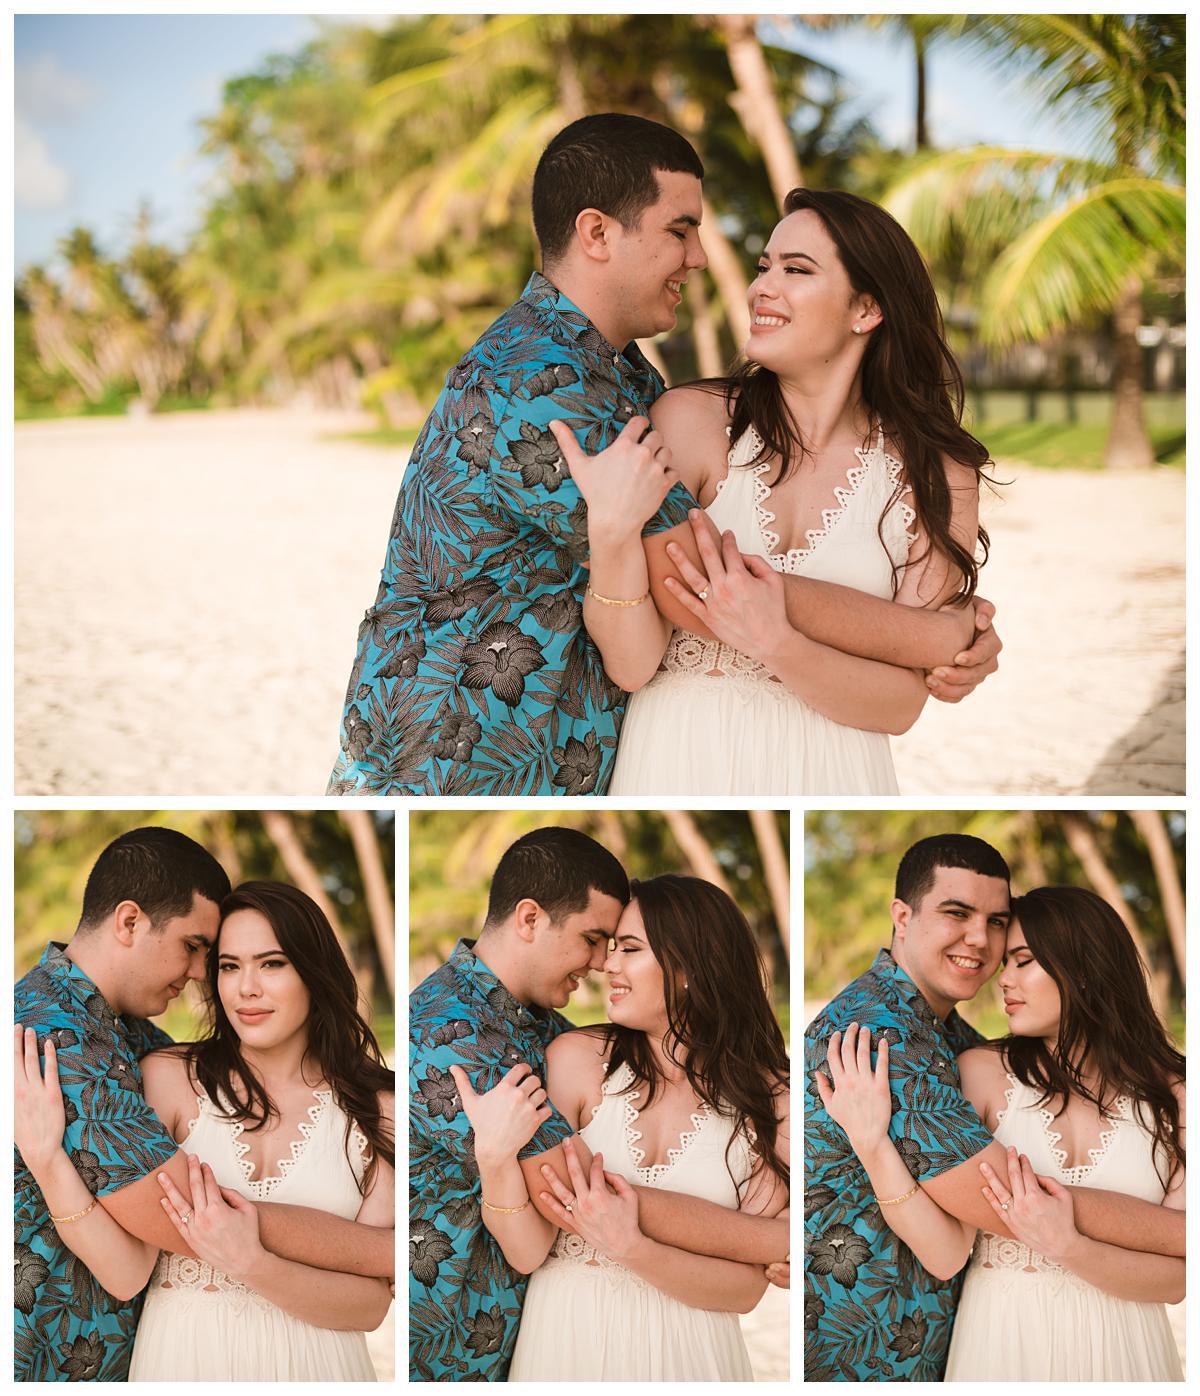 21PX_Guam_Photographers_Engagement Session_0009.jpg